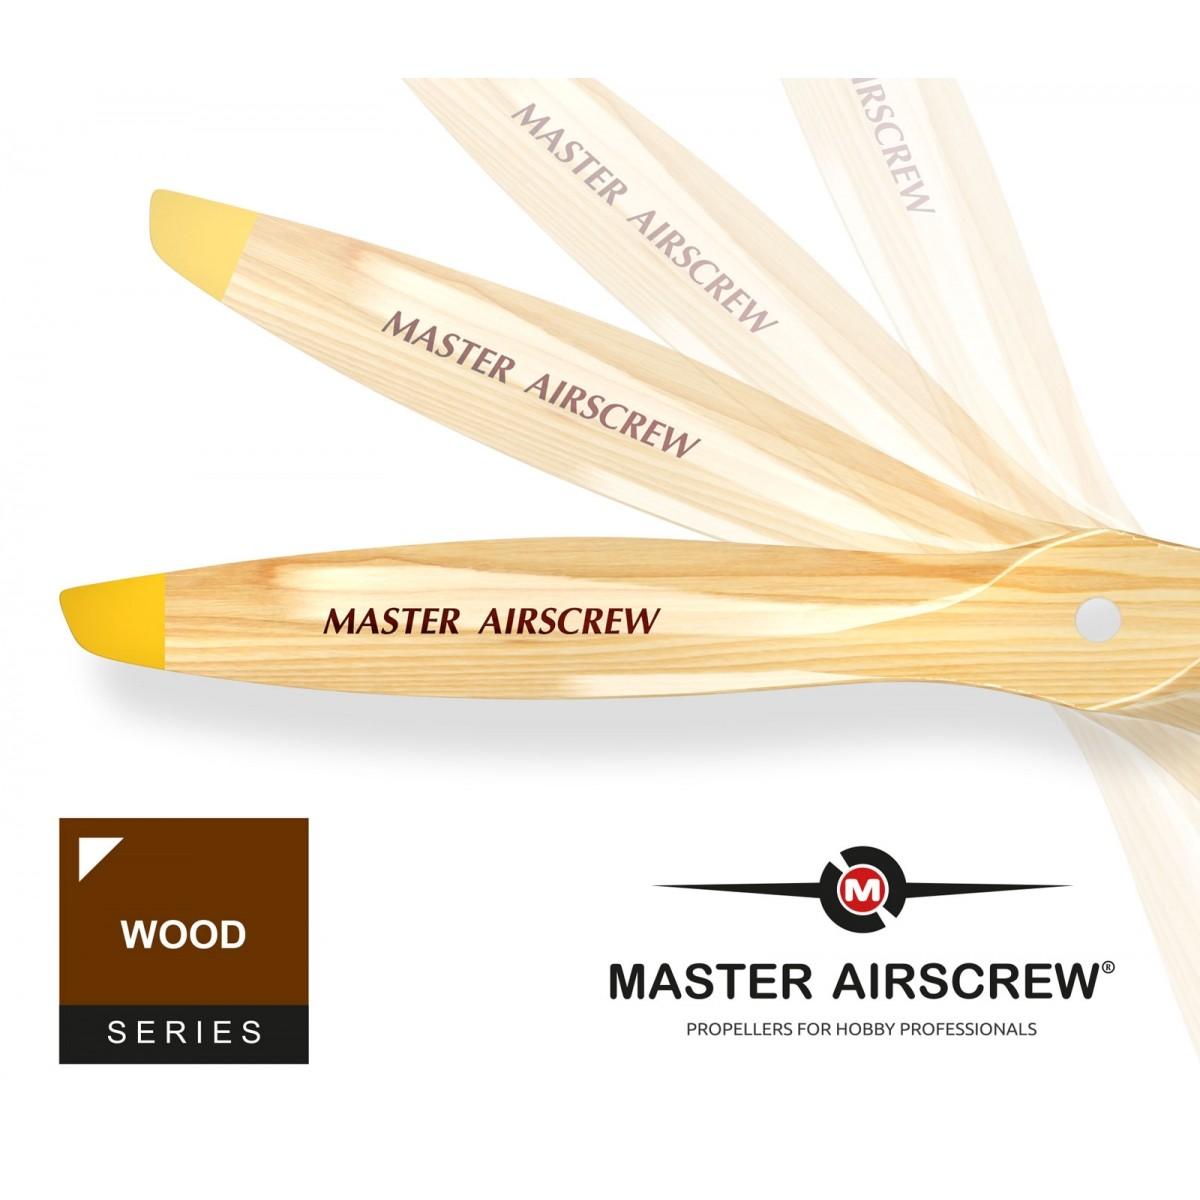 MA1260B - Hélice Master Airscrew Wood Series 12X6